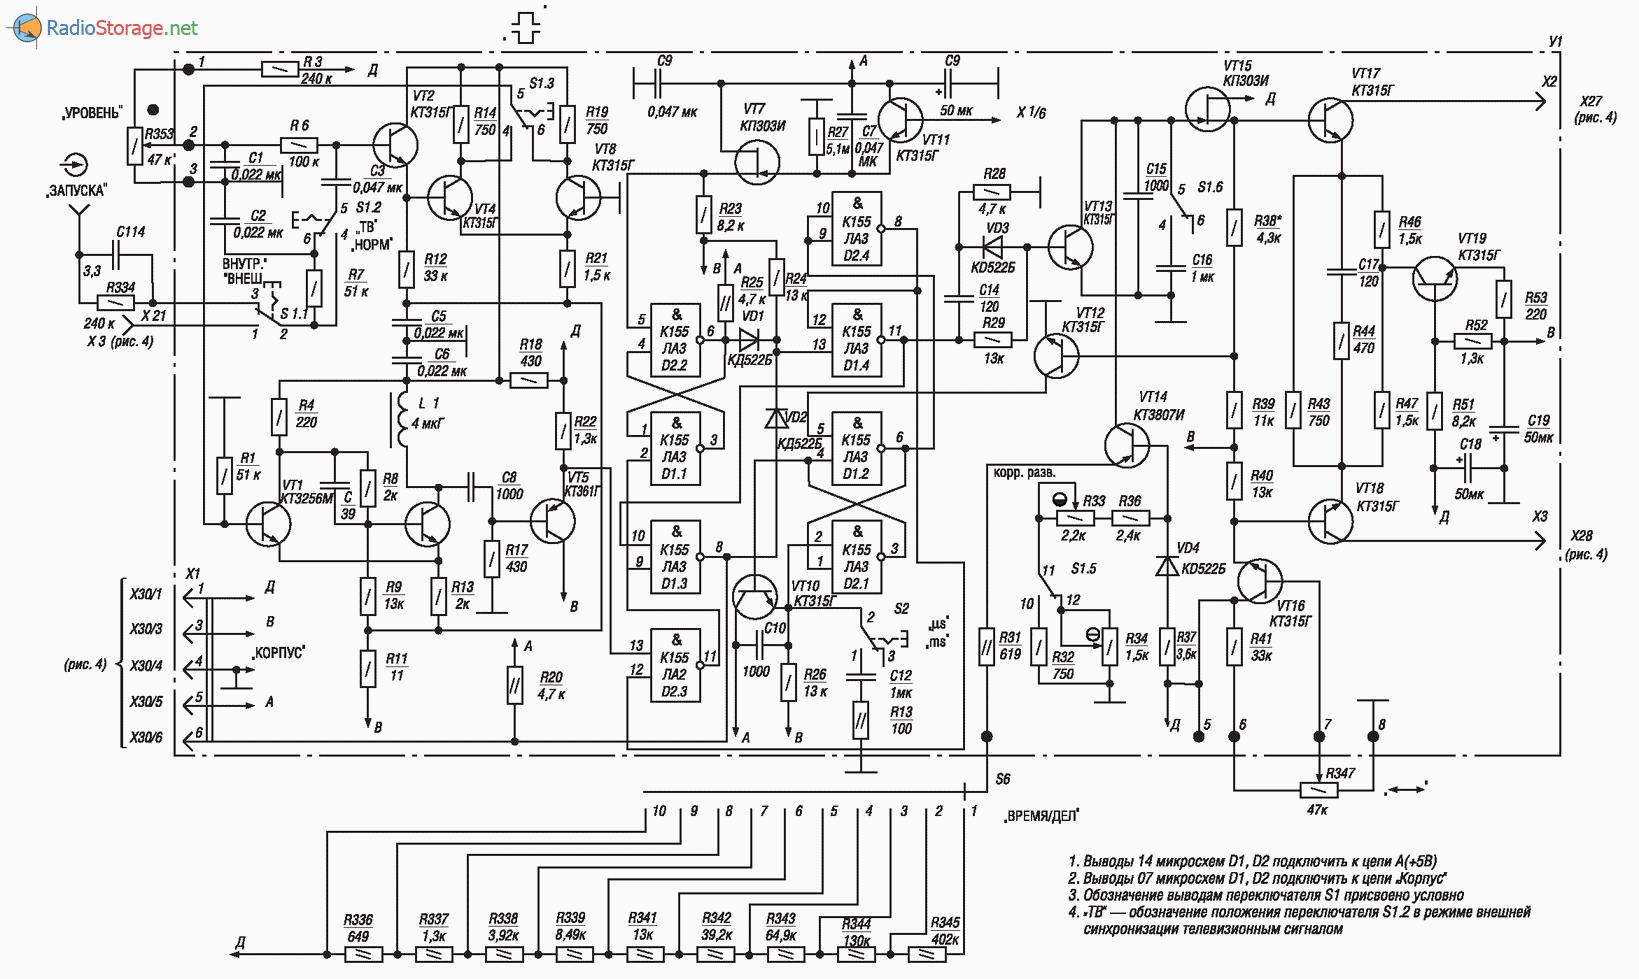 Схема осциллографа с1 112а фото 833